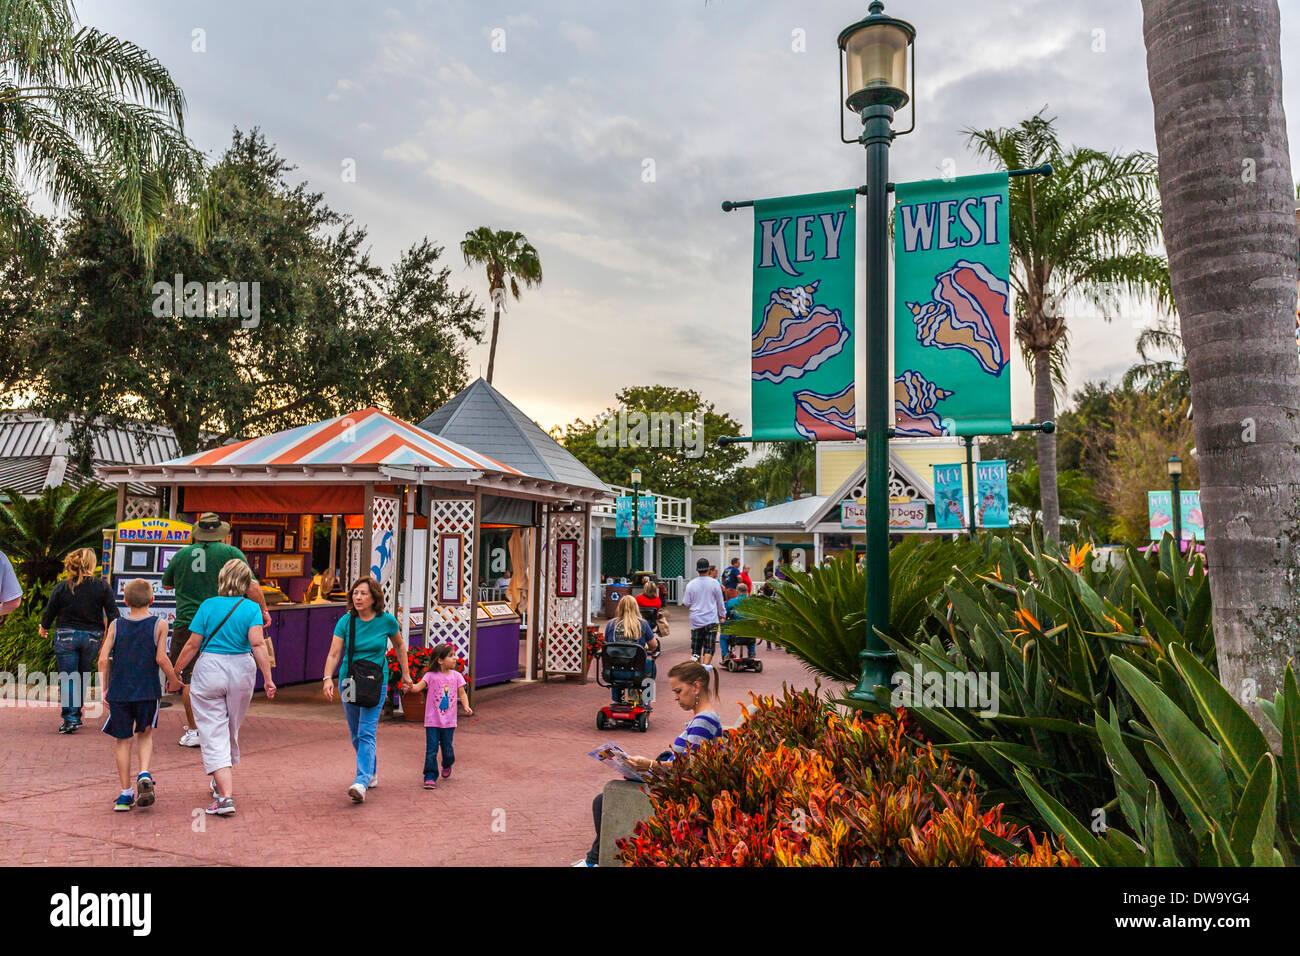 Families walk through the Key West area of SeaWorld, Orlando - Stock Image